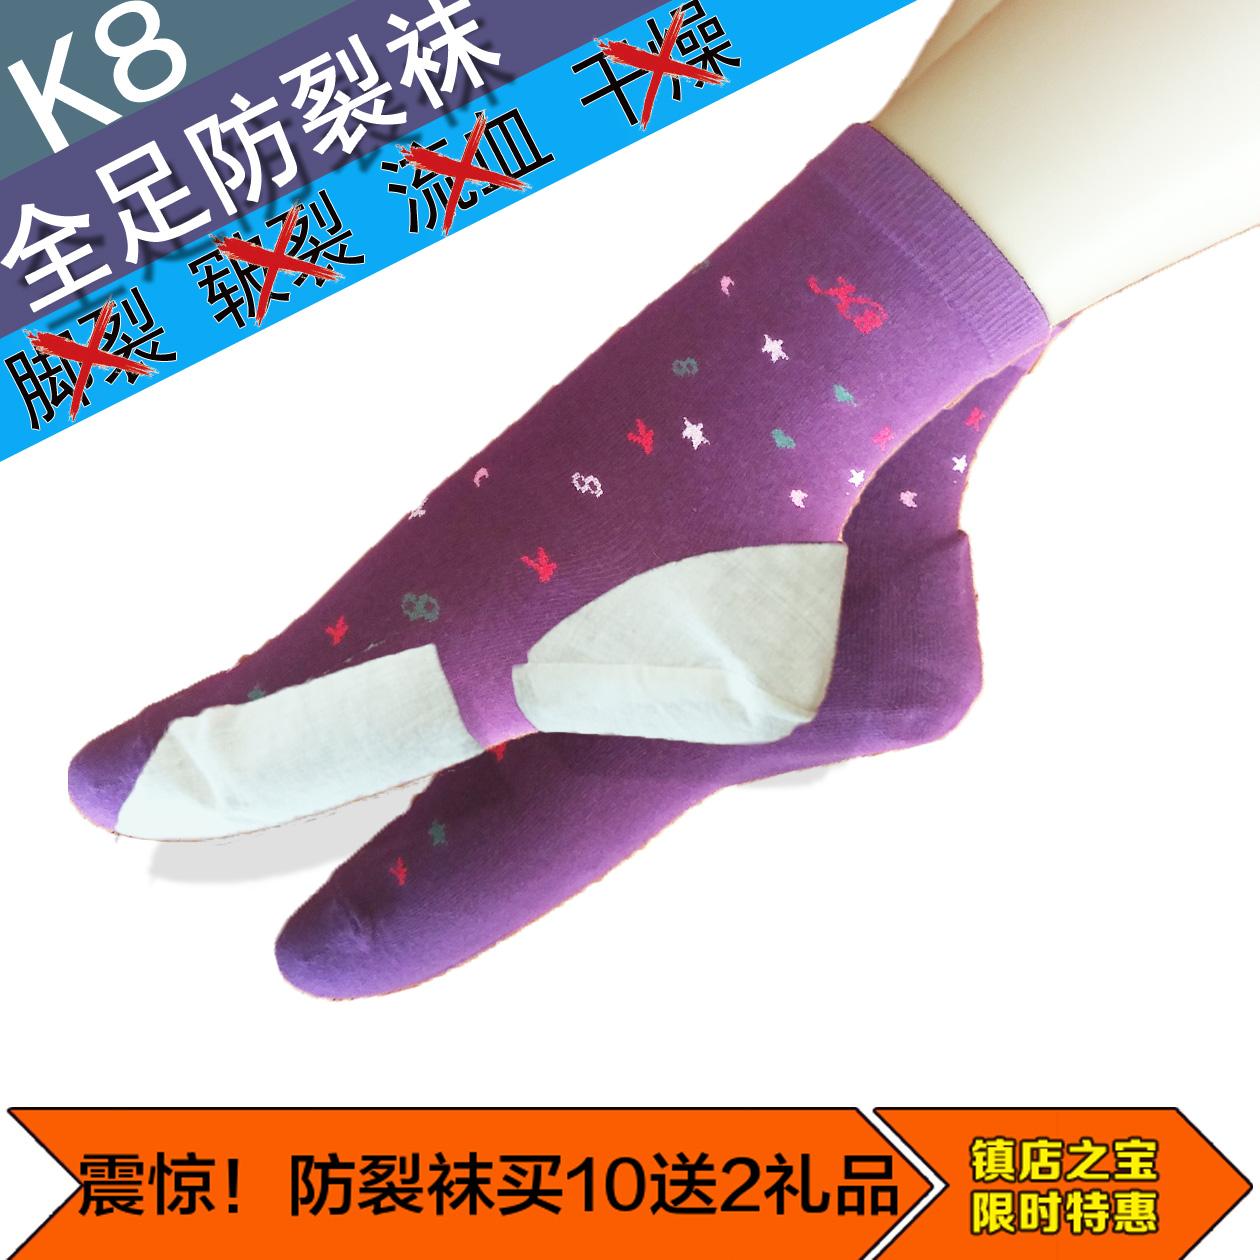 K8全足全脚防裂袜子 男款女款 防护足裂脚裂功能 脚后跟皲裂疼痛